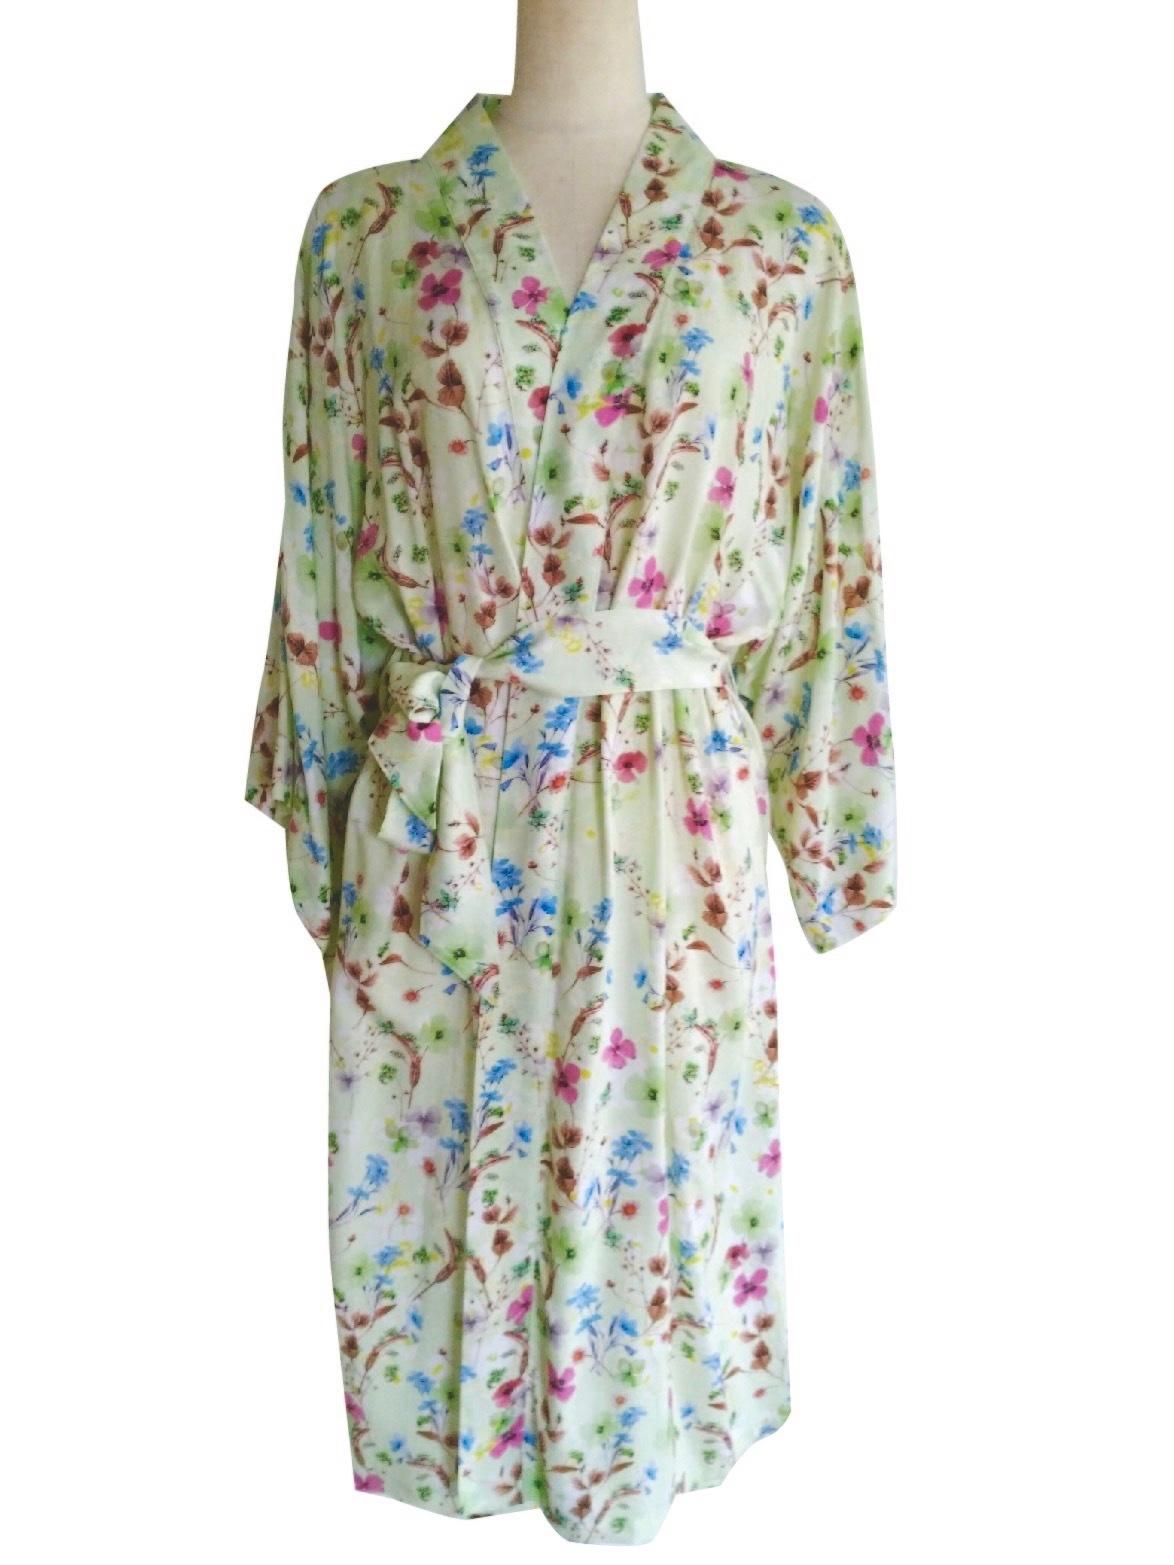 Kimono Robe Midium length Pansy Mint ローブミディアム丈 パンジーミント